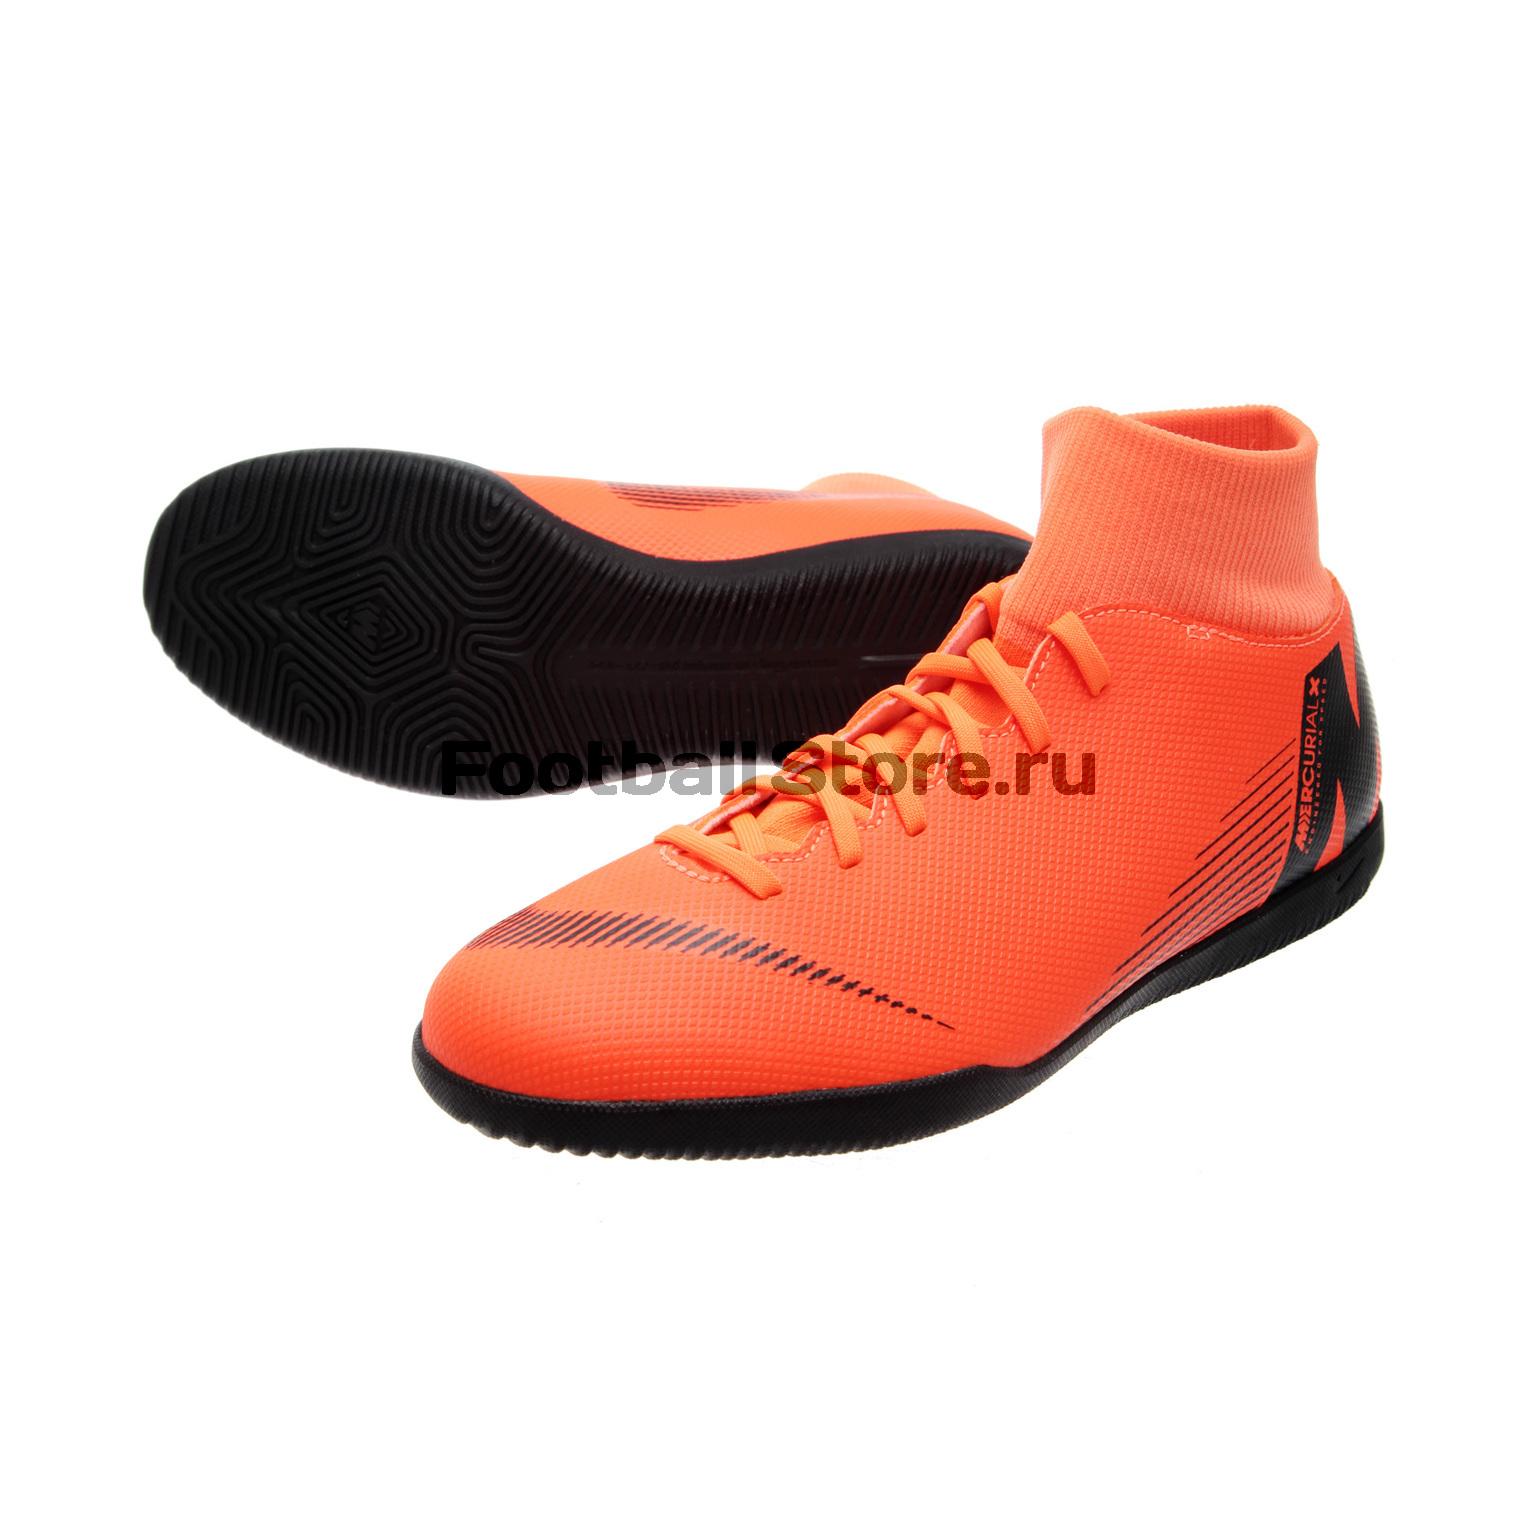 Обувь для зала Nike SuperflyX 6 Club IC AH7371-810 обувь для зала nike phantom vision club df ic ao3271 001